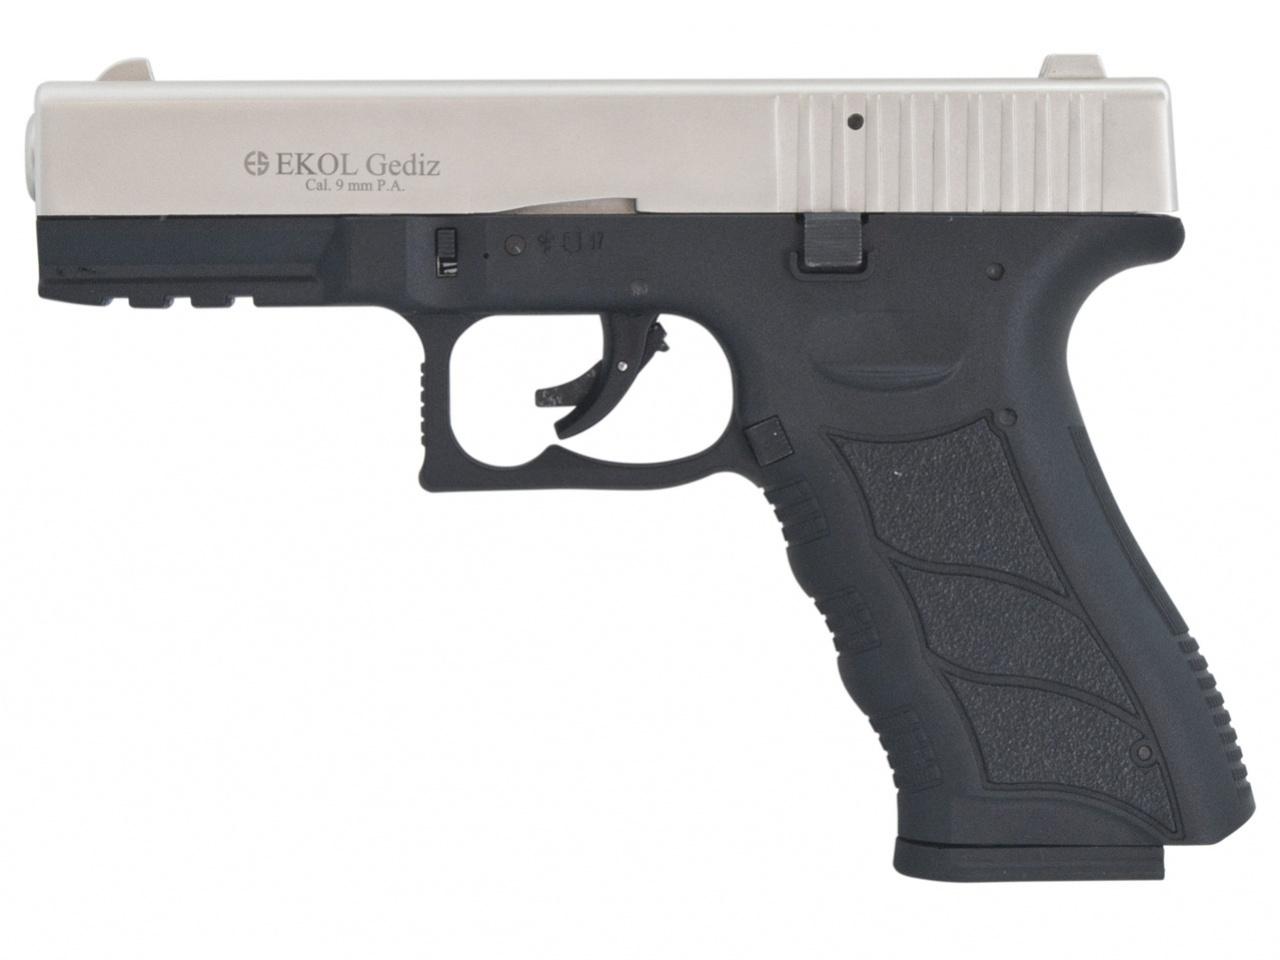 Pistolet gazowy Ekol Gediz satyn kal.9mm